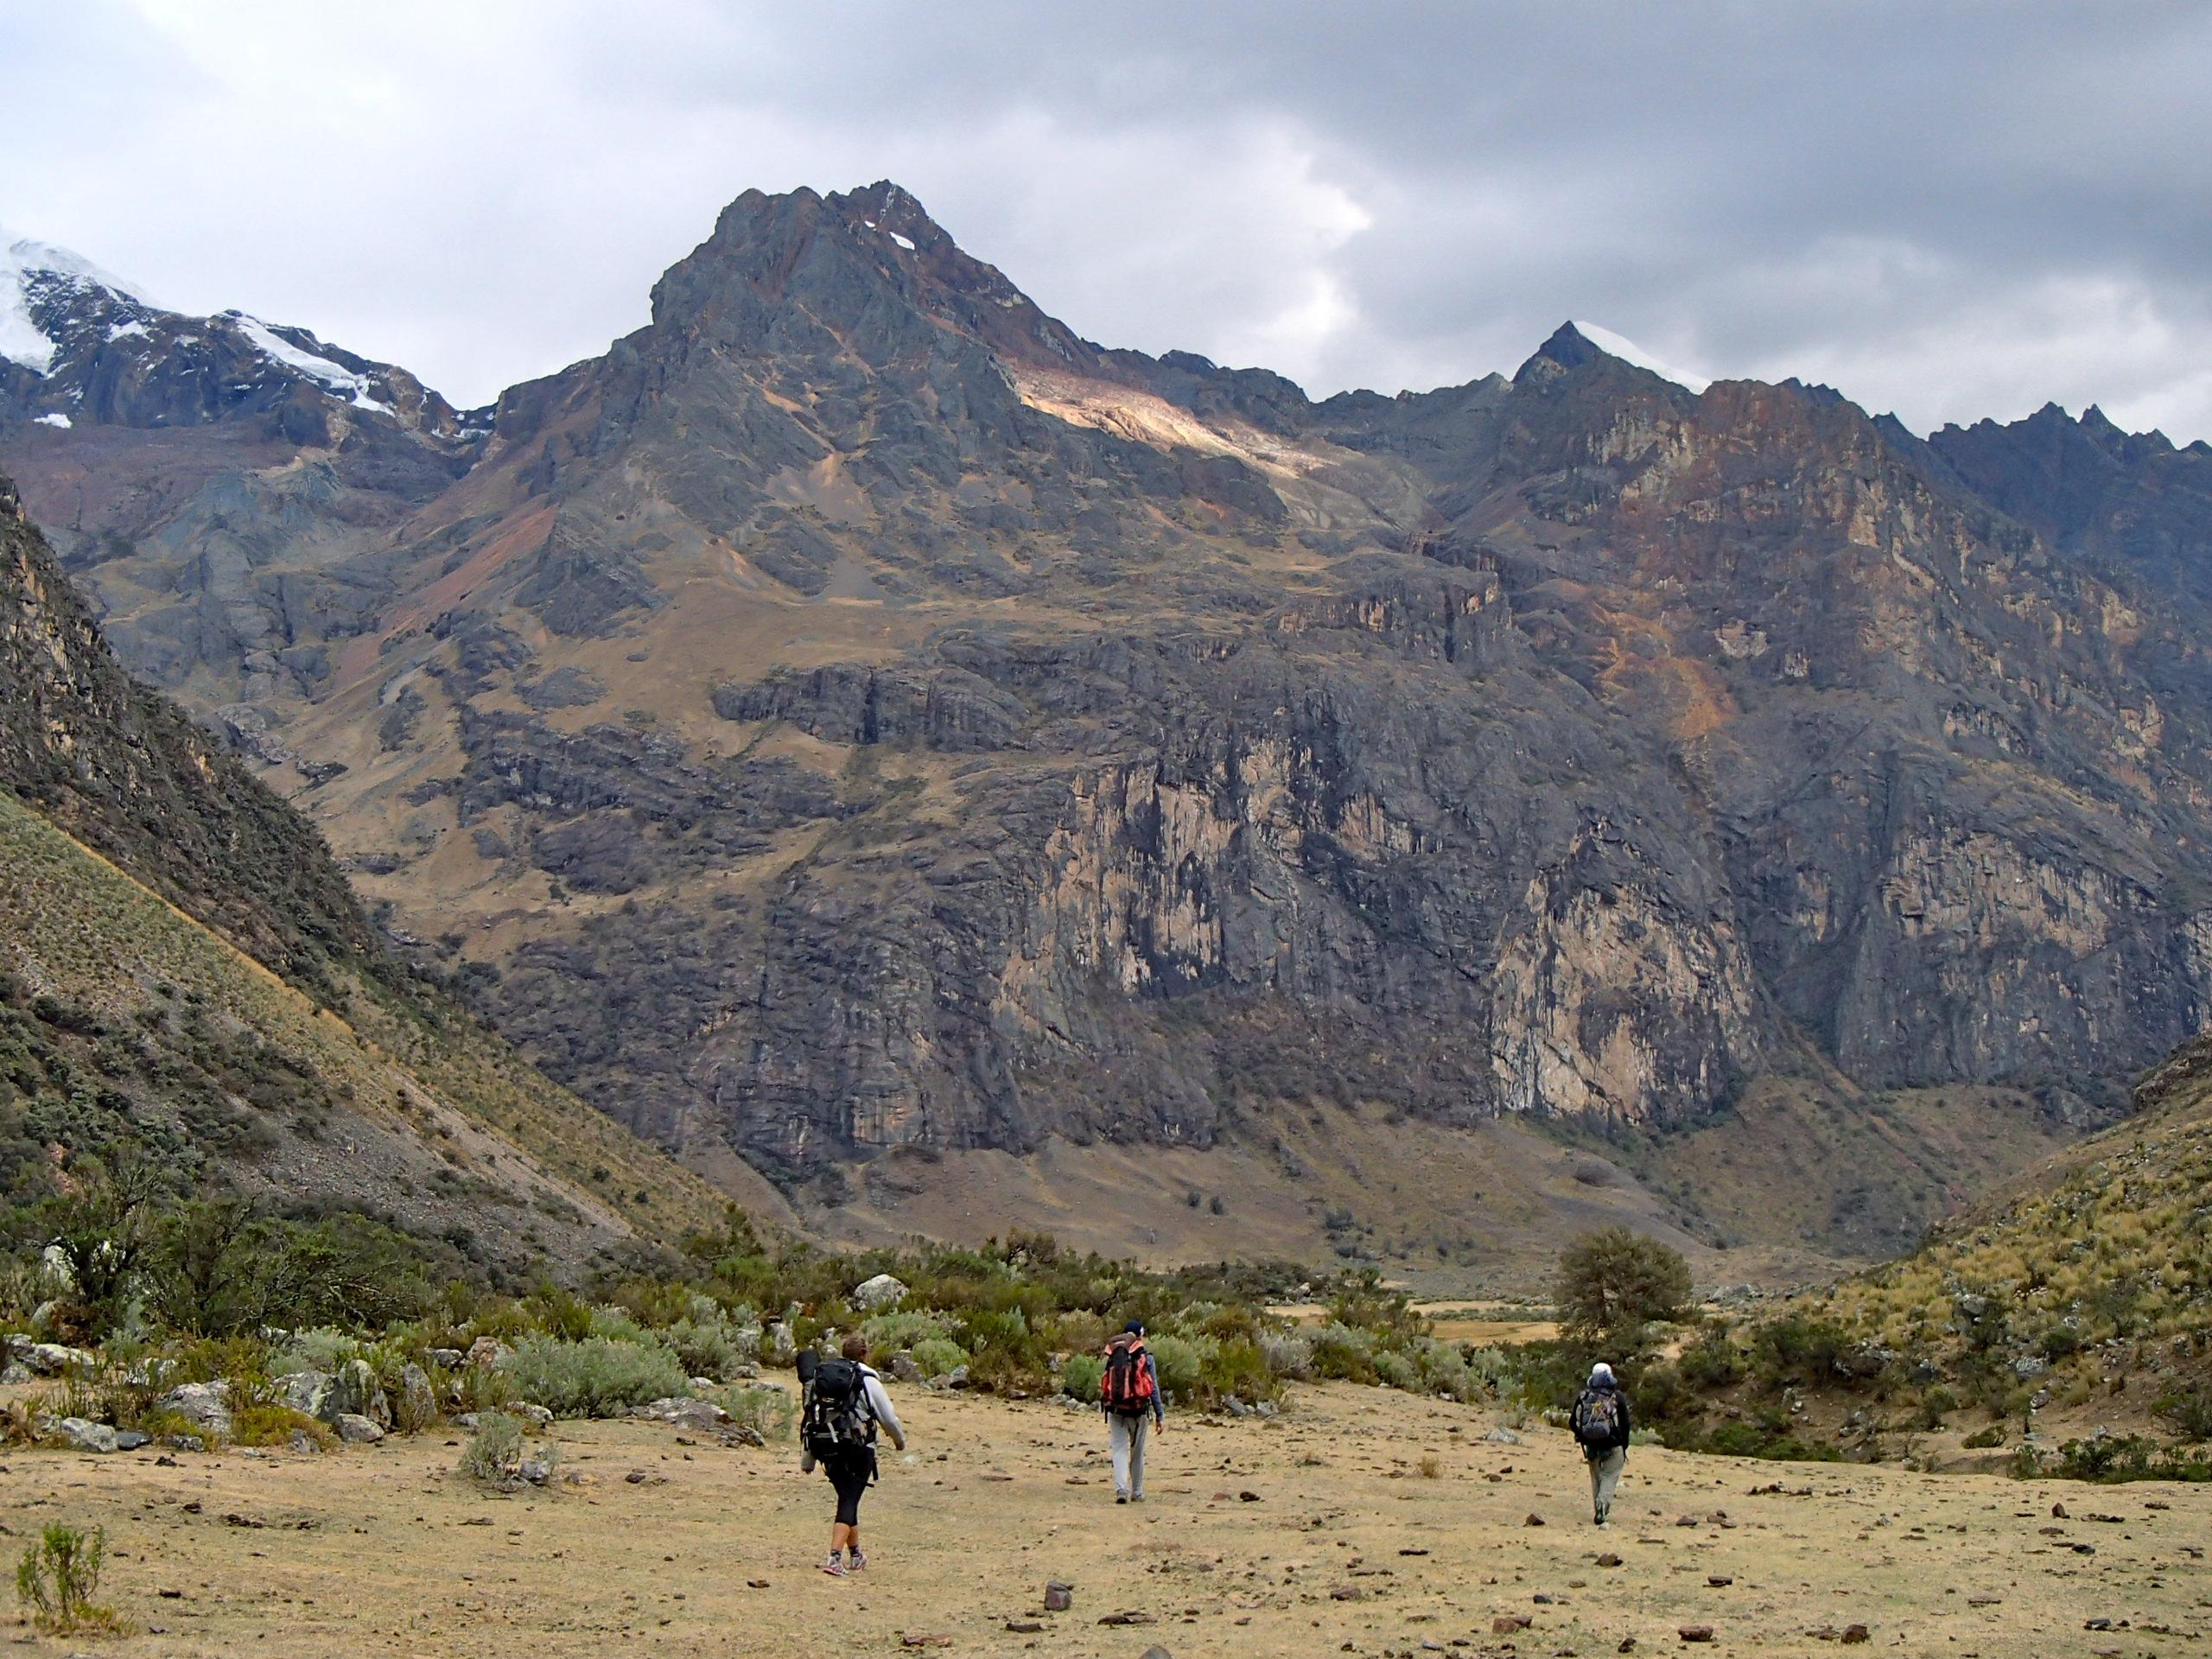 Hiking into the Qhilcayhuanca Valley, Cordillera Blanca